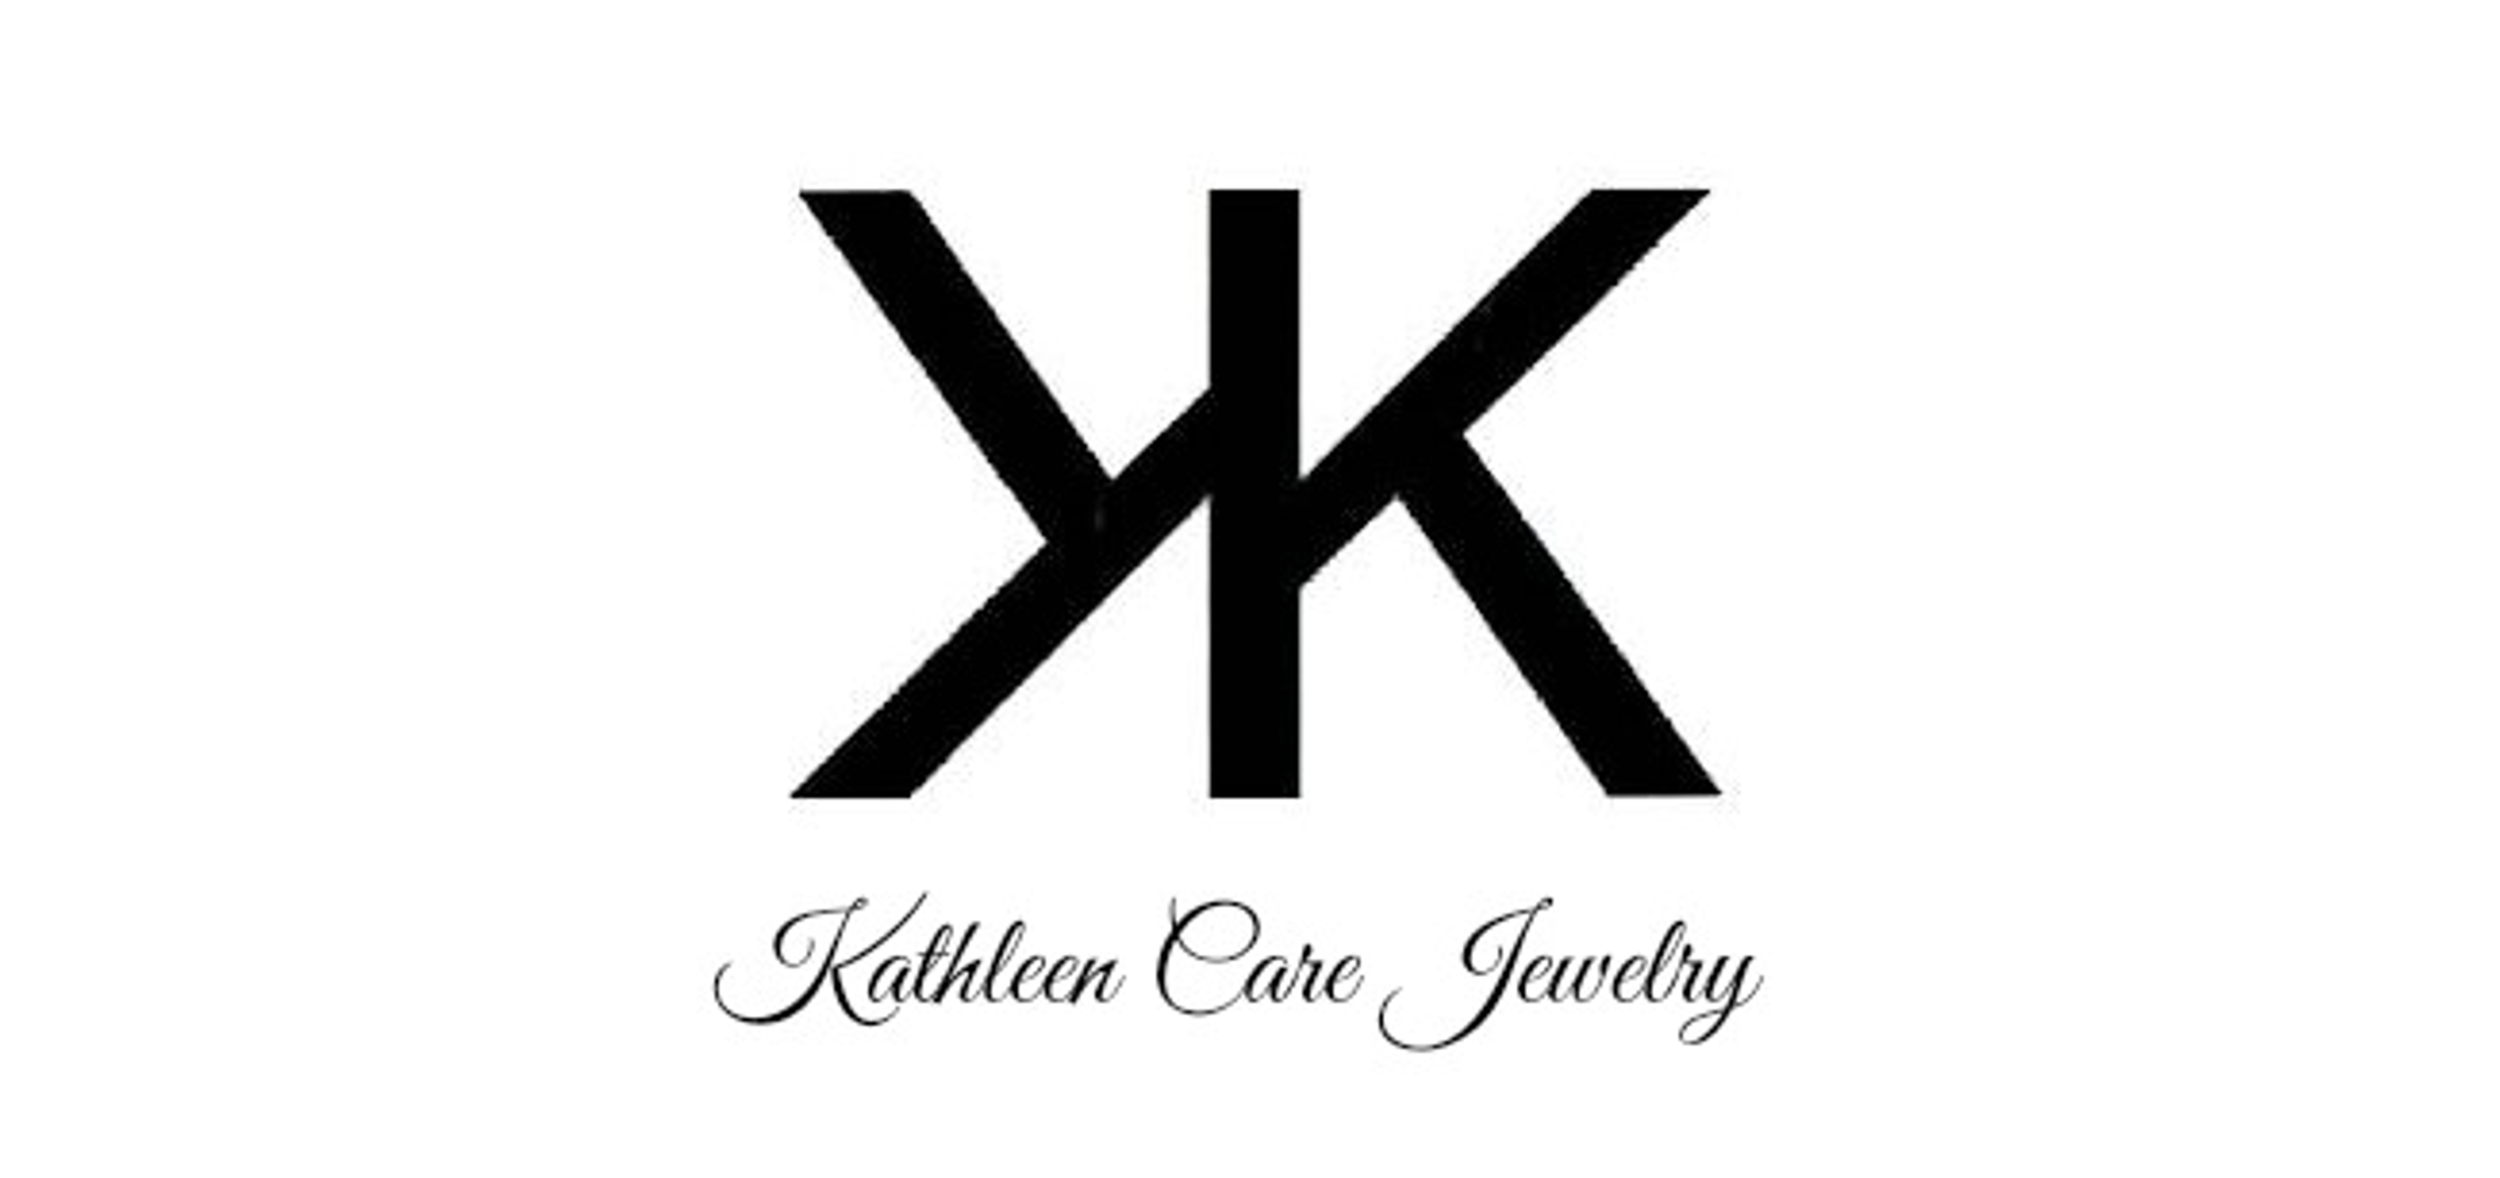 Kathleen Care Jewelry